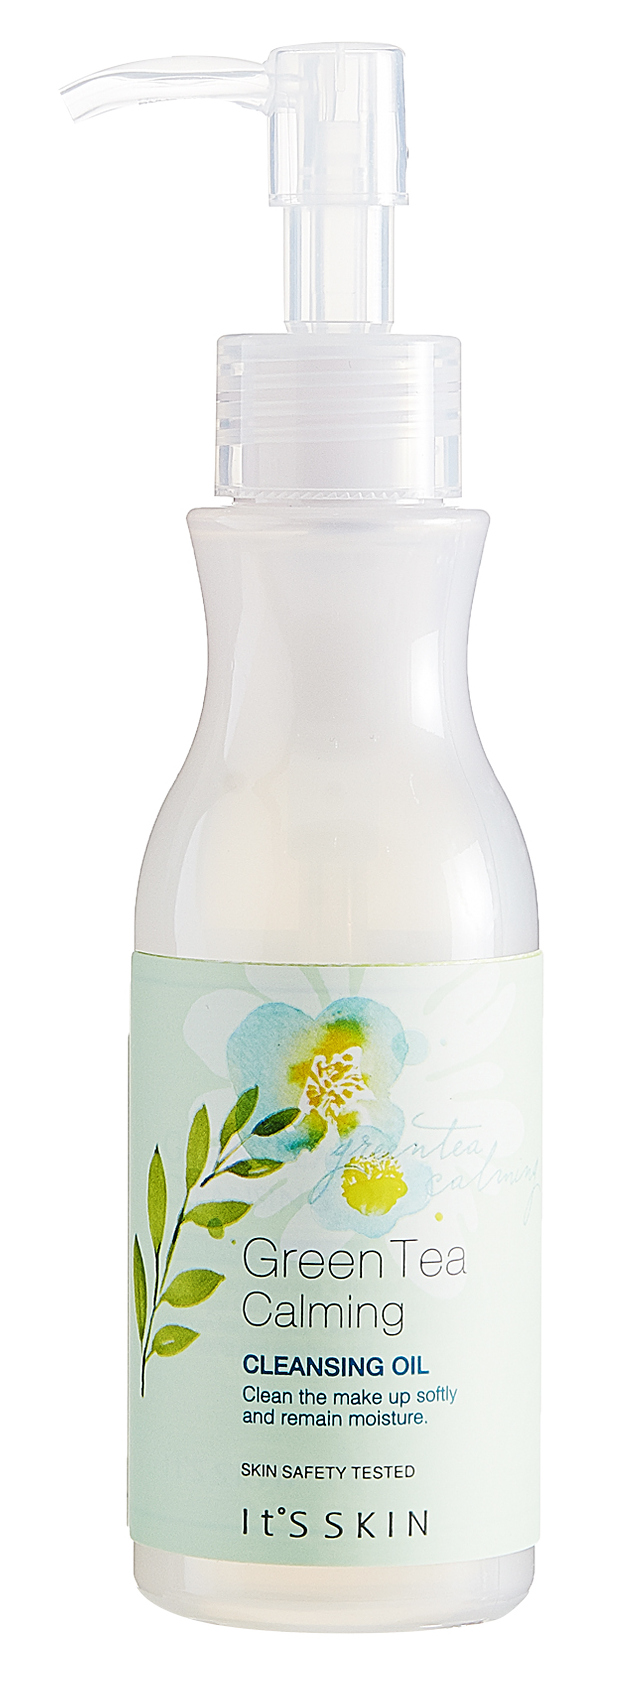 It'S SKIN Масло гидрофильное успокаивающее Грин Ти / Green Tea Calming Cleansing Oil 145 мл